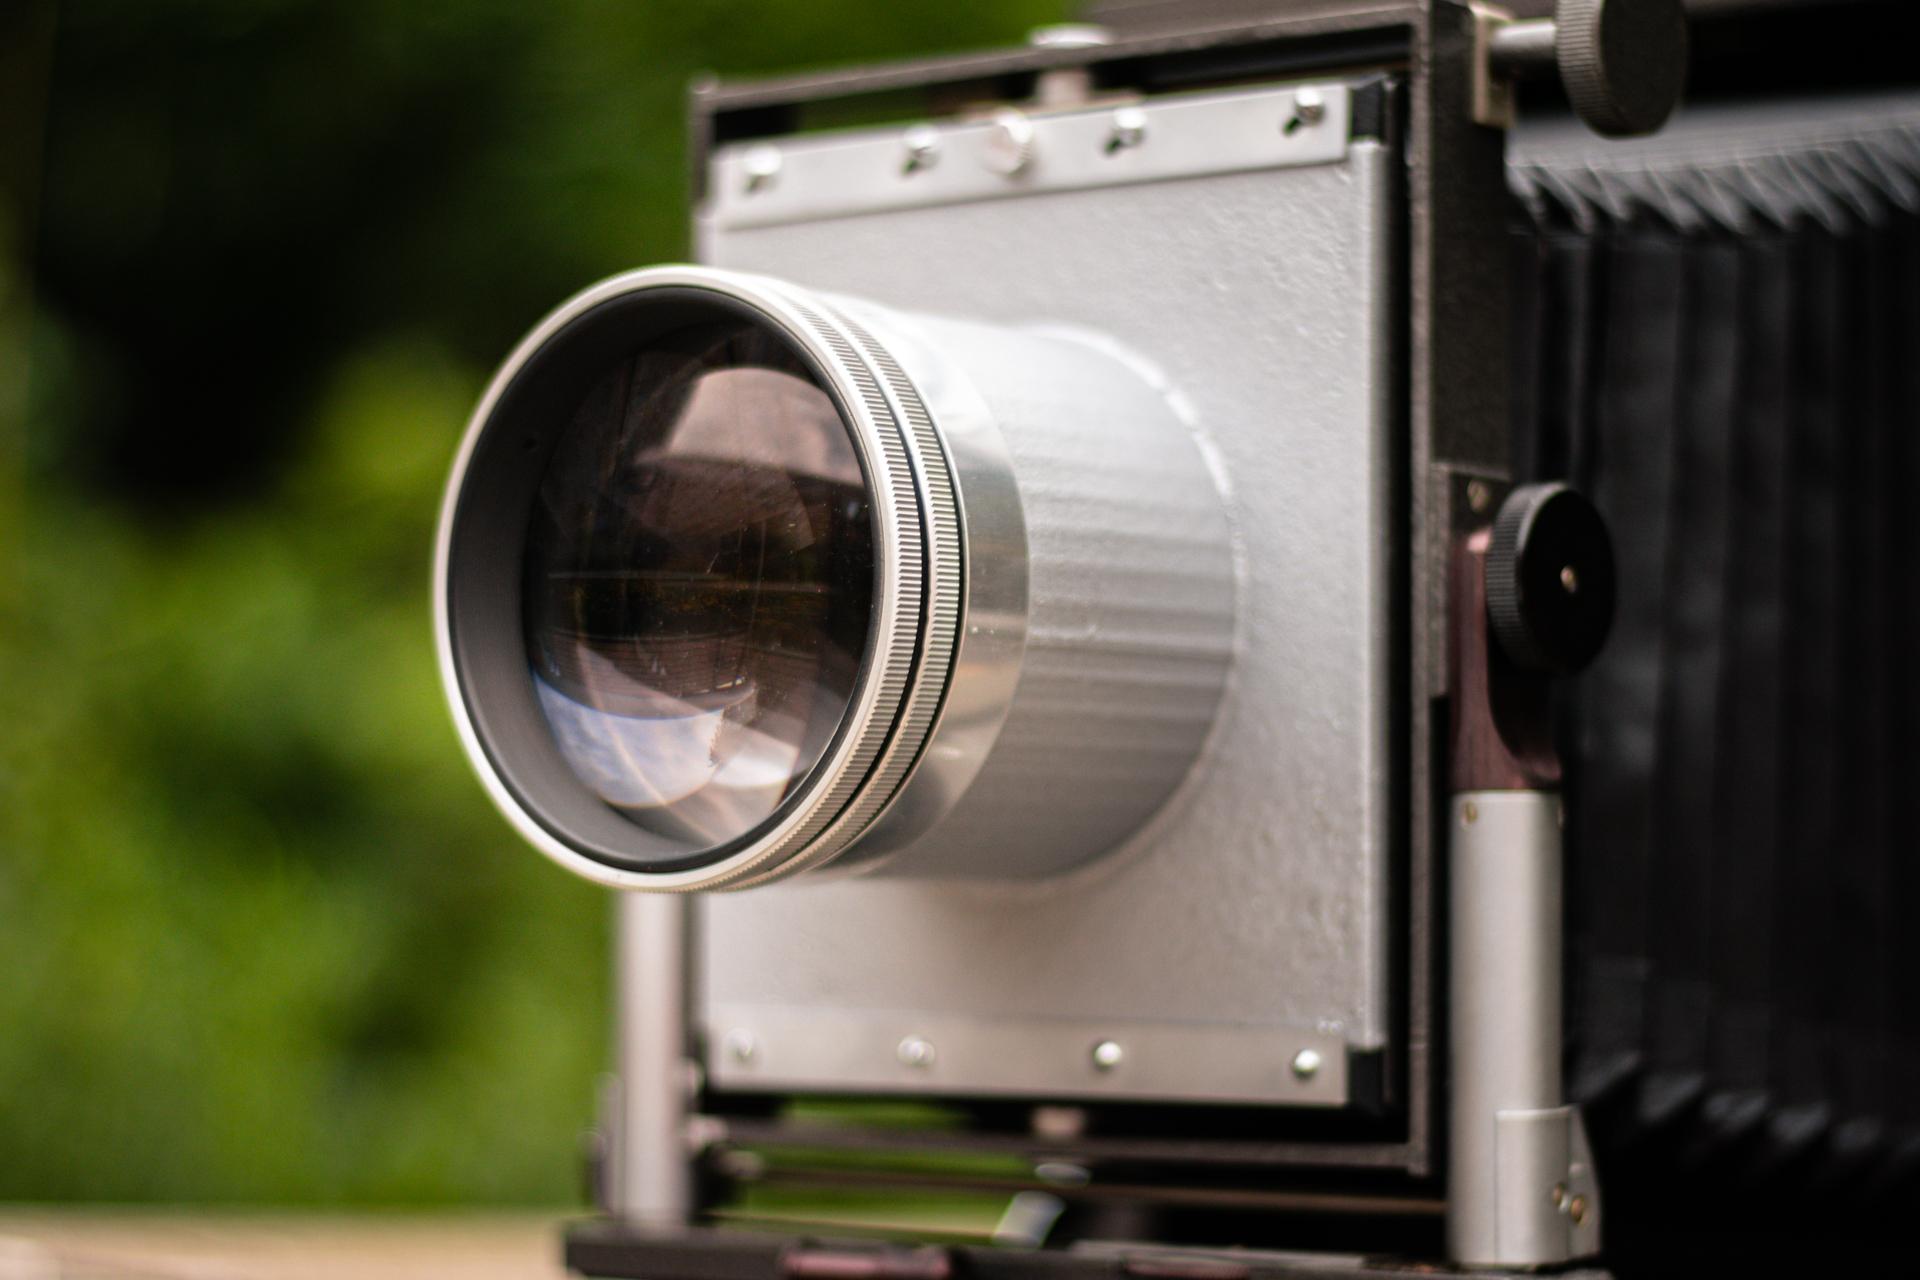 Shooting_Wet_Plate_Portraits_with_an_affordable_Large_Format_Bokeh_Monster_Markus_Hofstaetter_mhaustria.com_9_200mm_F2.5_Leitz_Hektor_on_mentor_camera